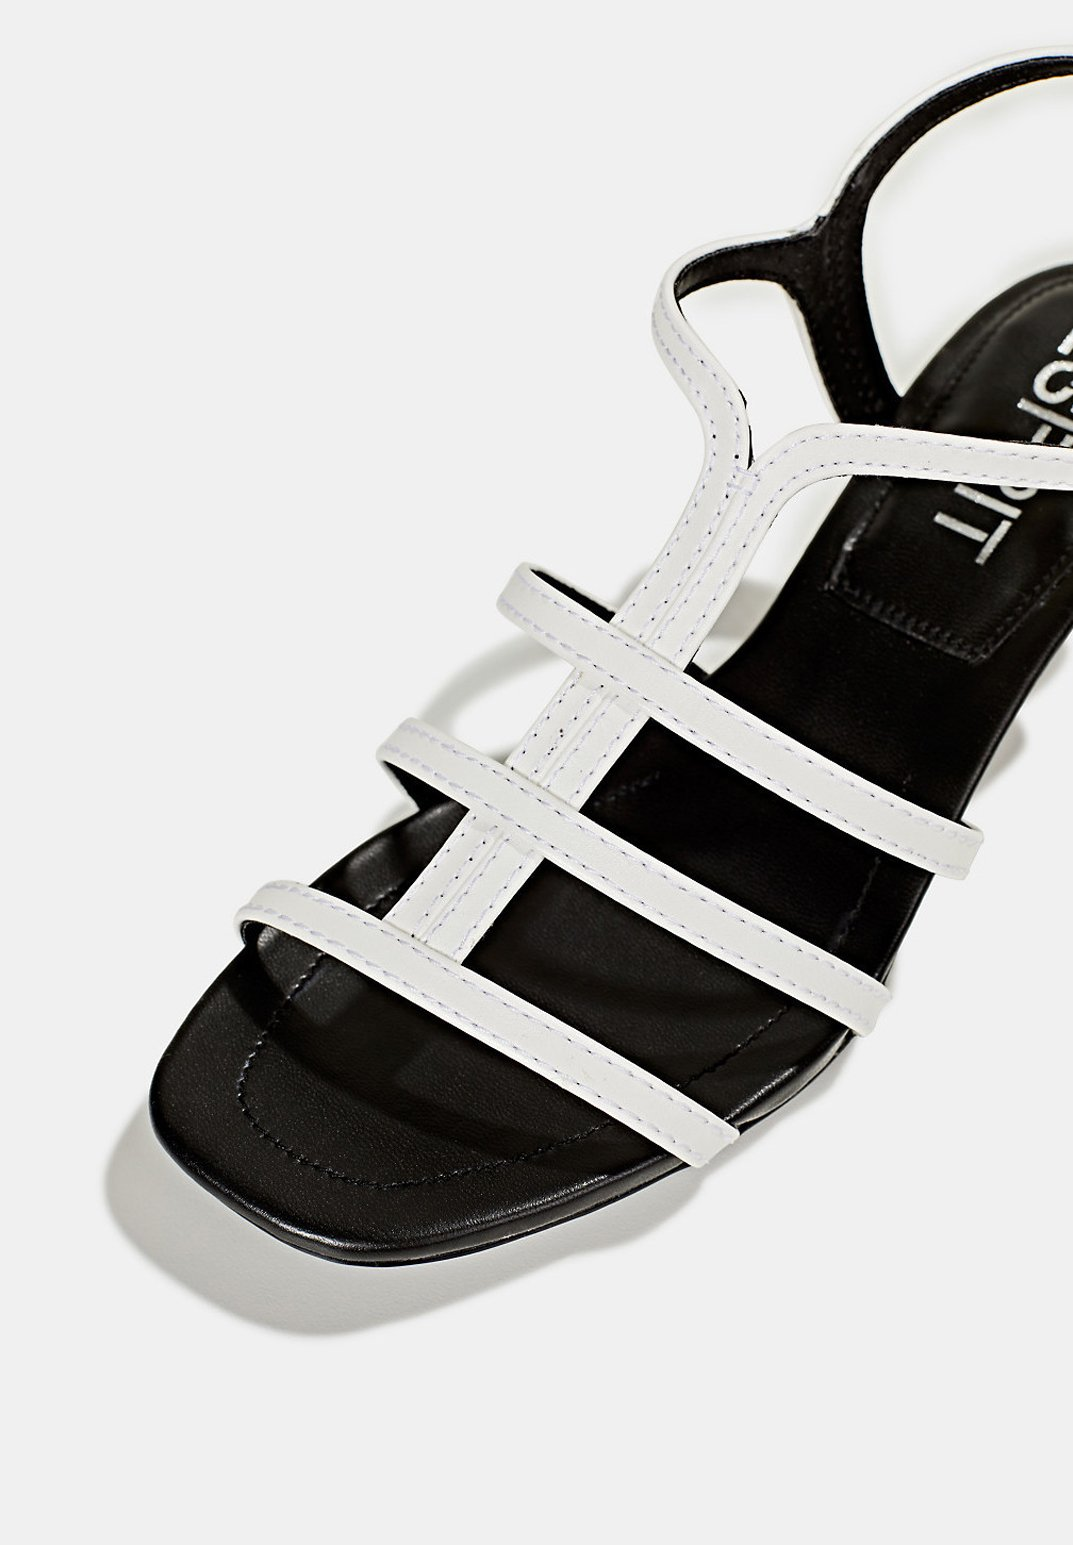 Esprit Sandalette In Leder-optik - Sandales White